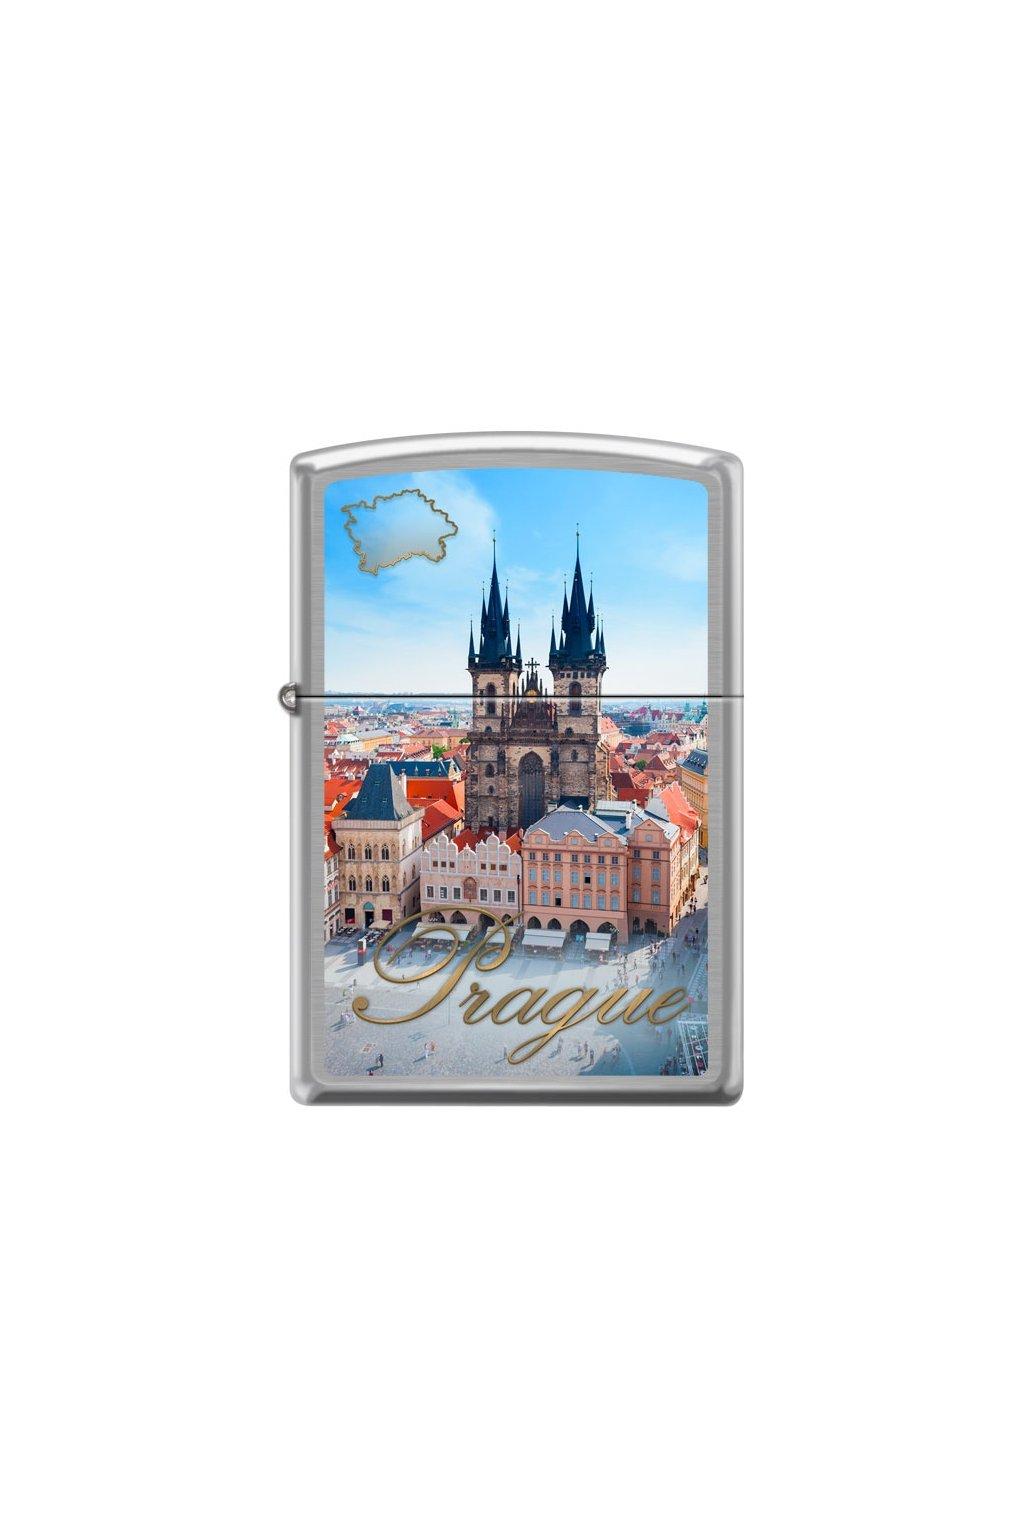 93236 zippo zapalovac 21889 prague old town square